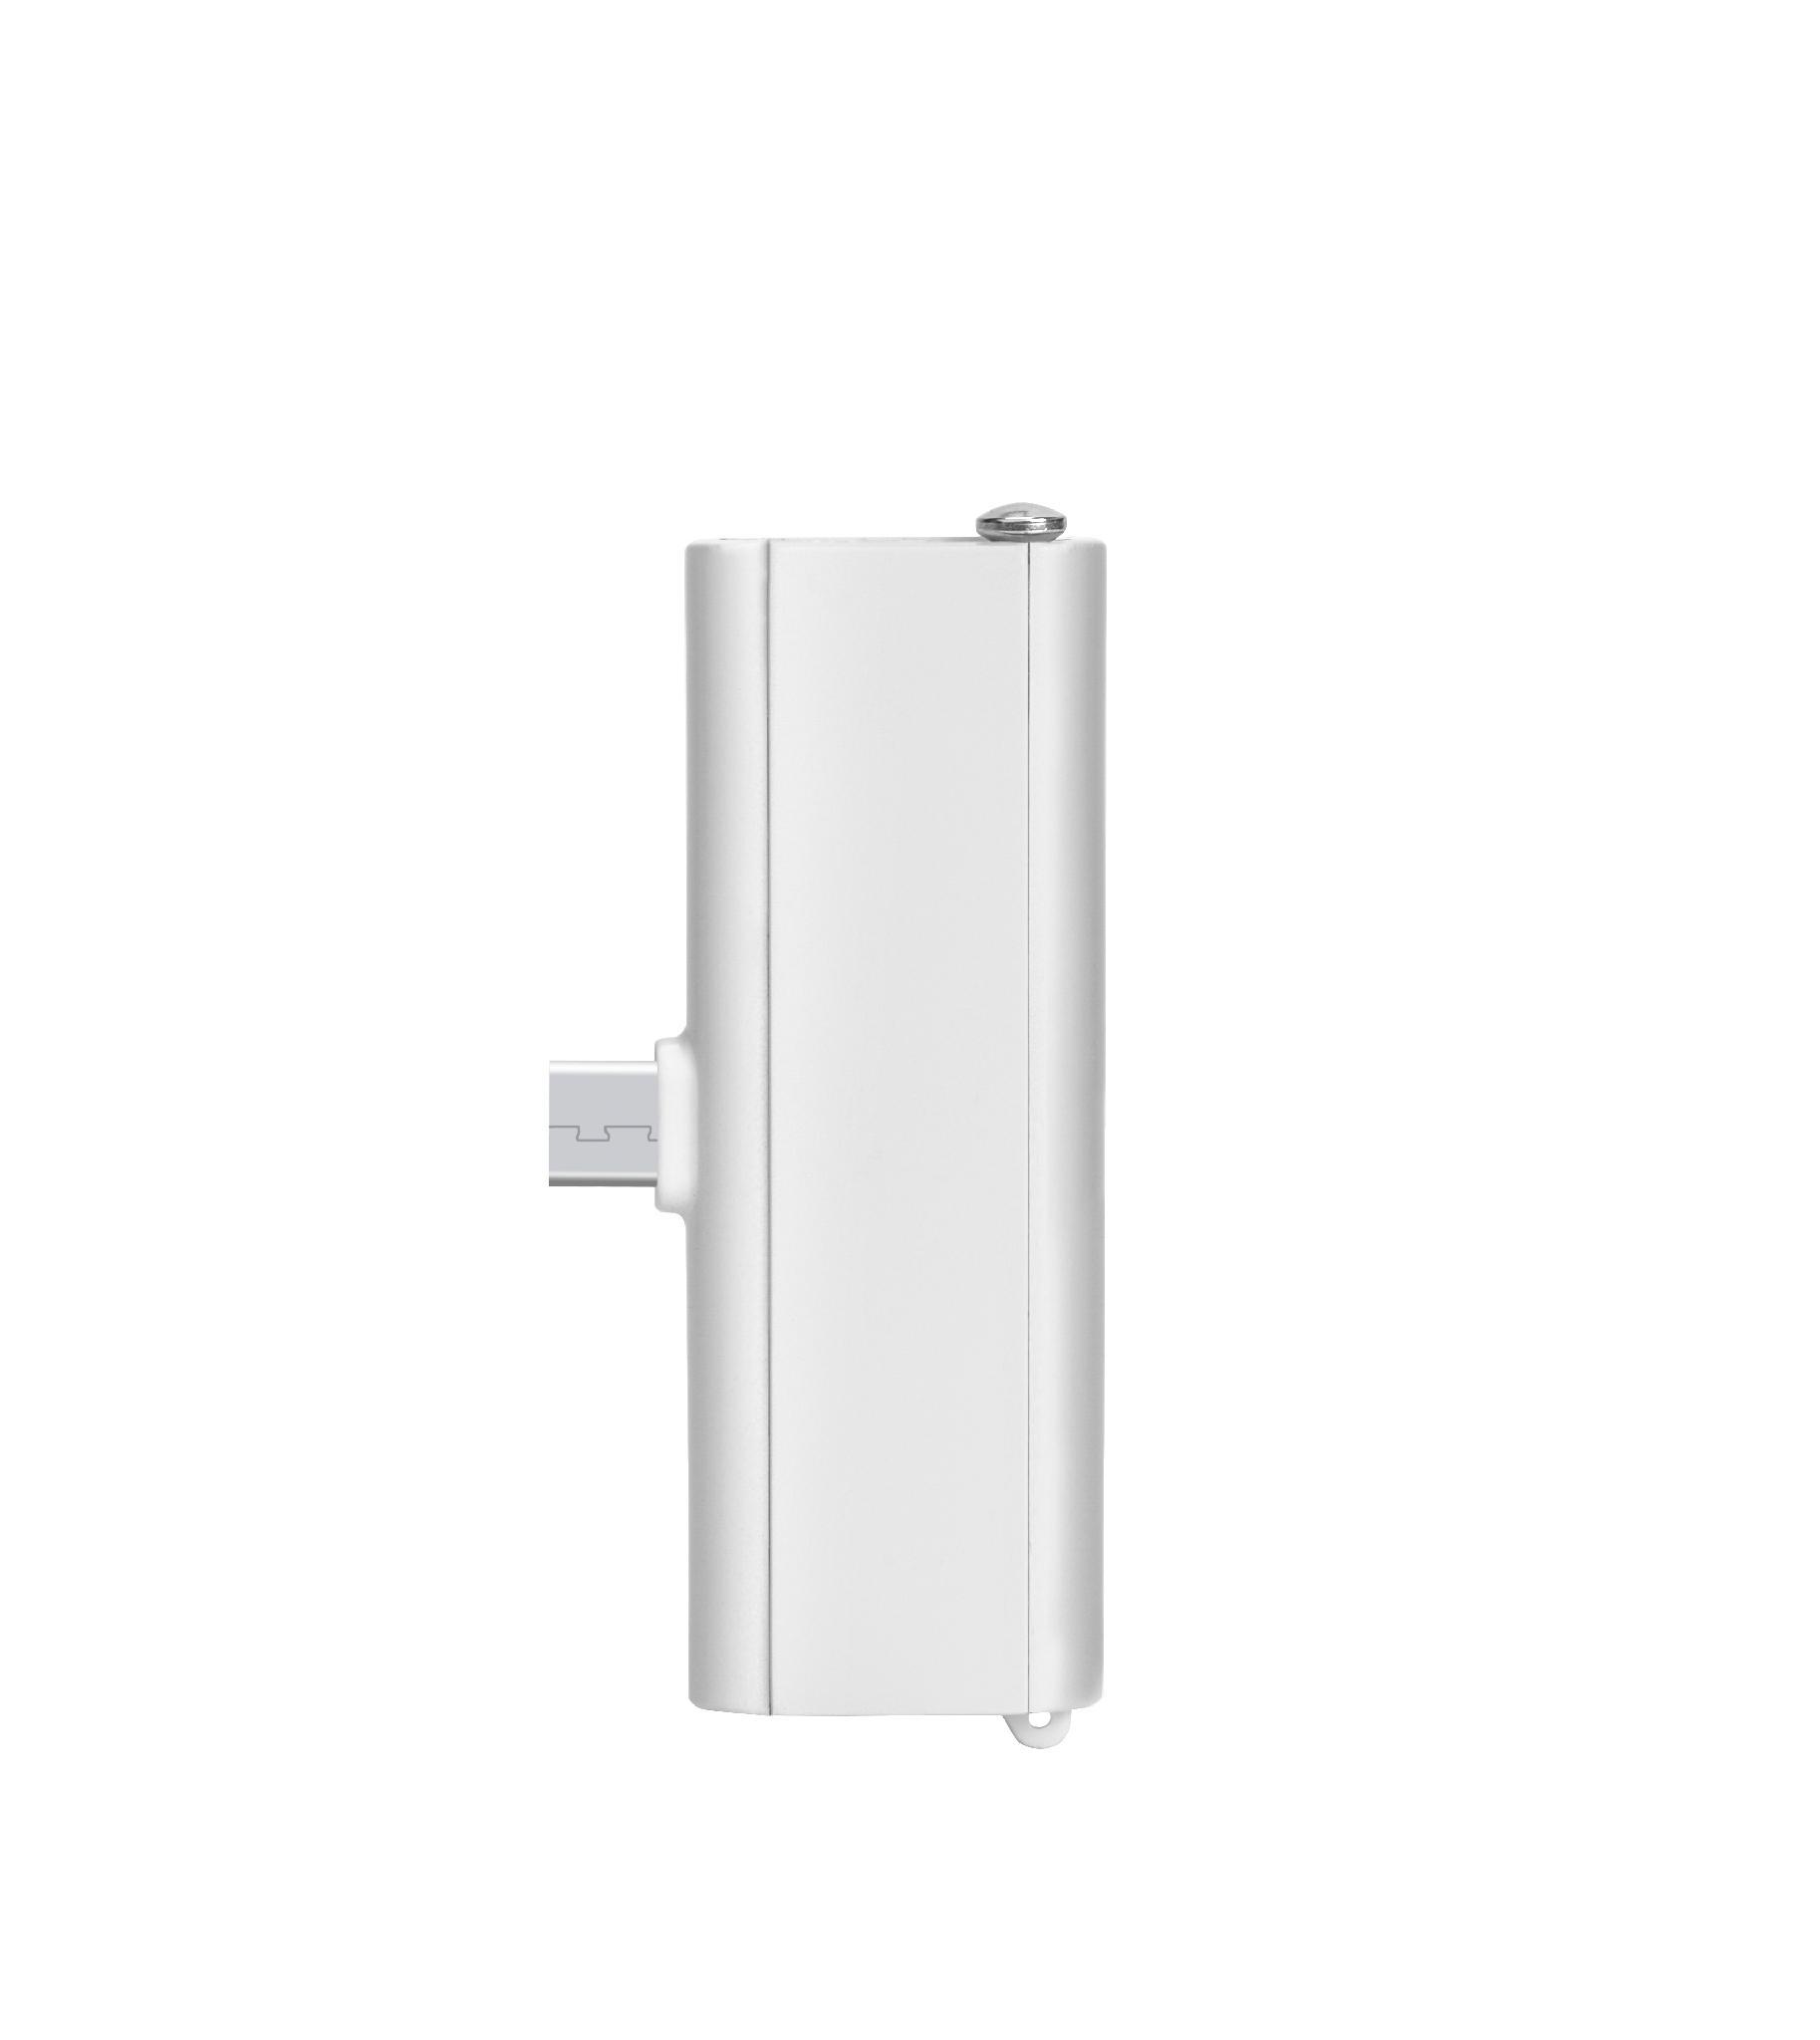 Lesee U2 DVB-T DVB-T2 USB TV tuner receiver dongle 3